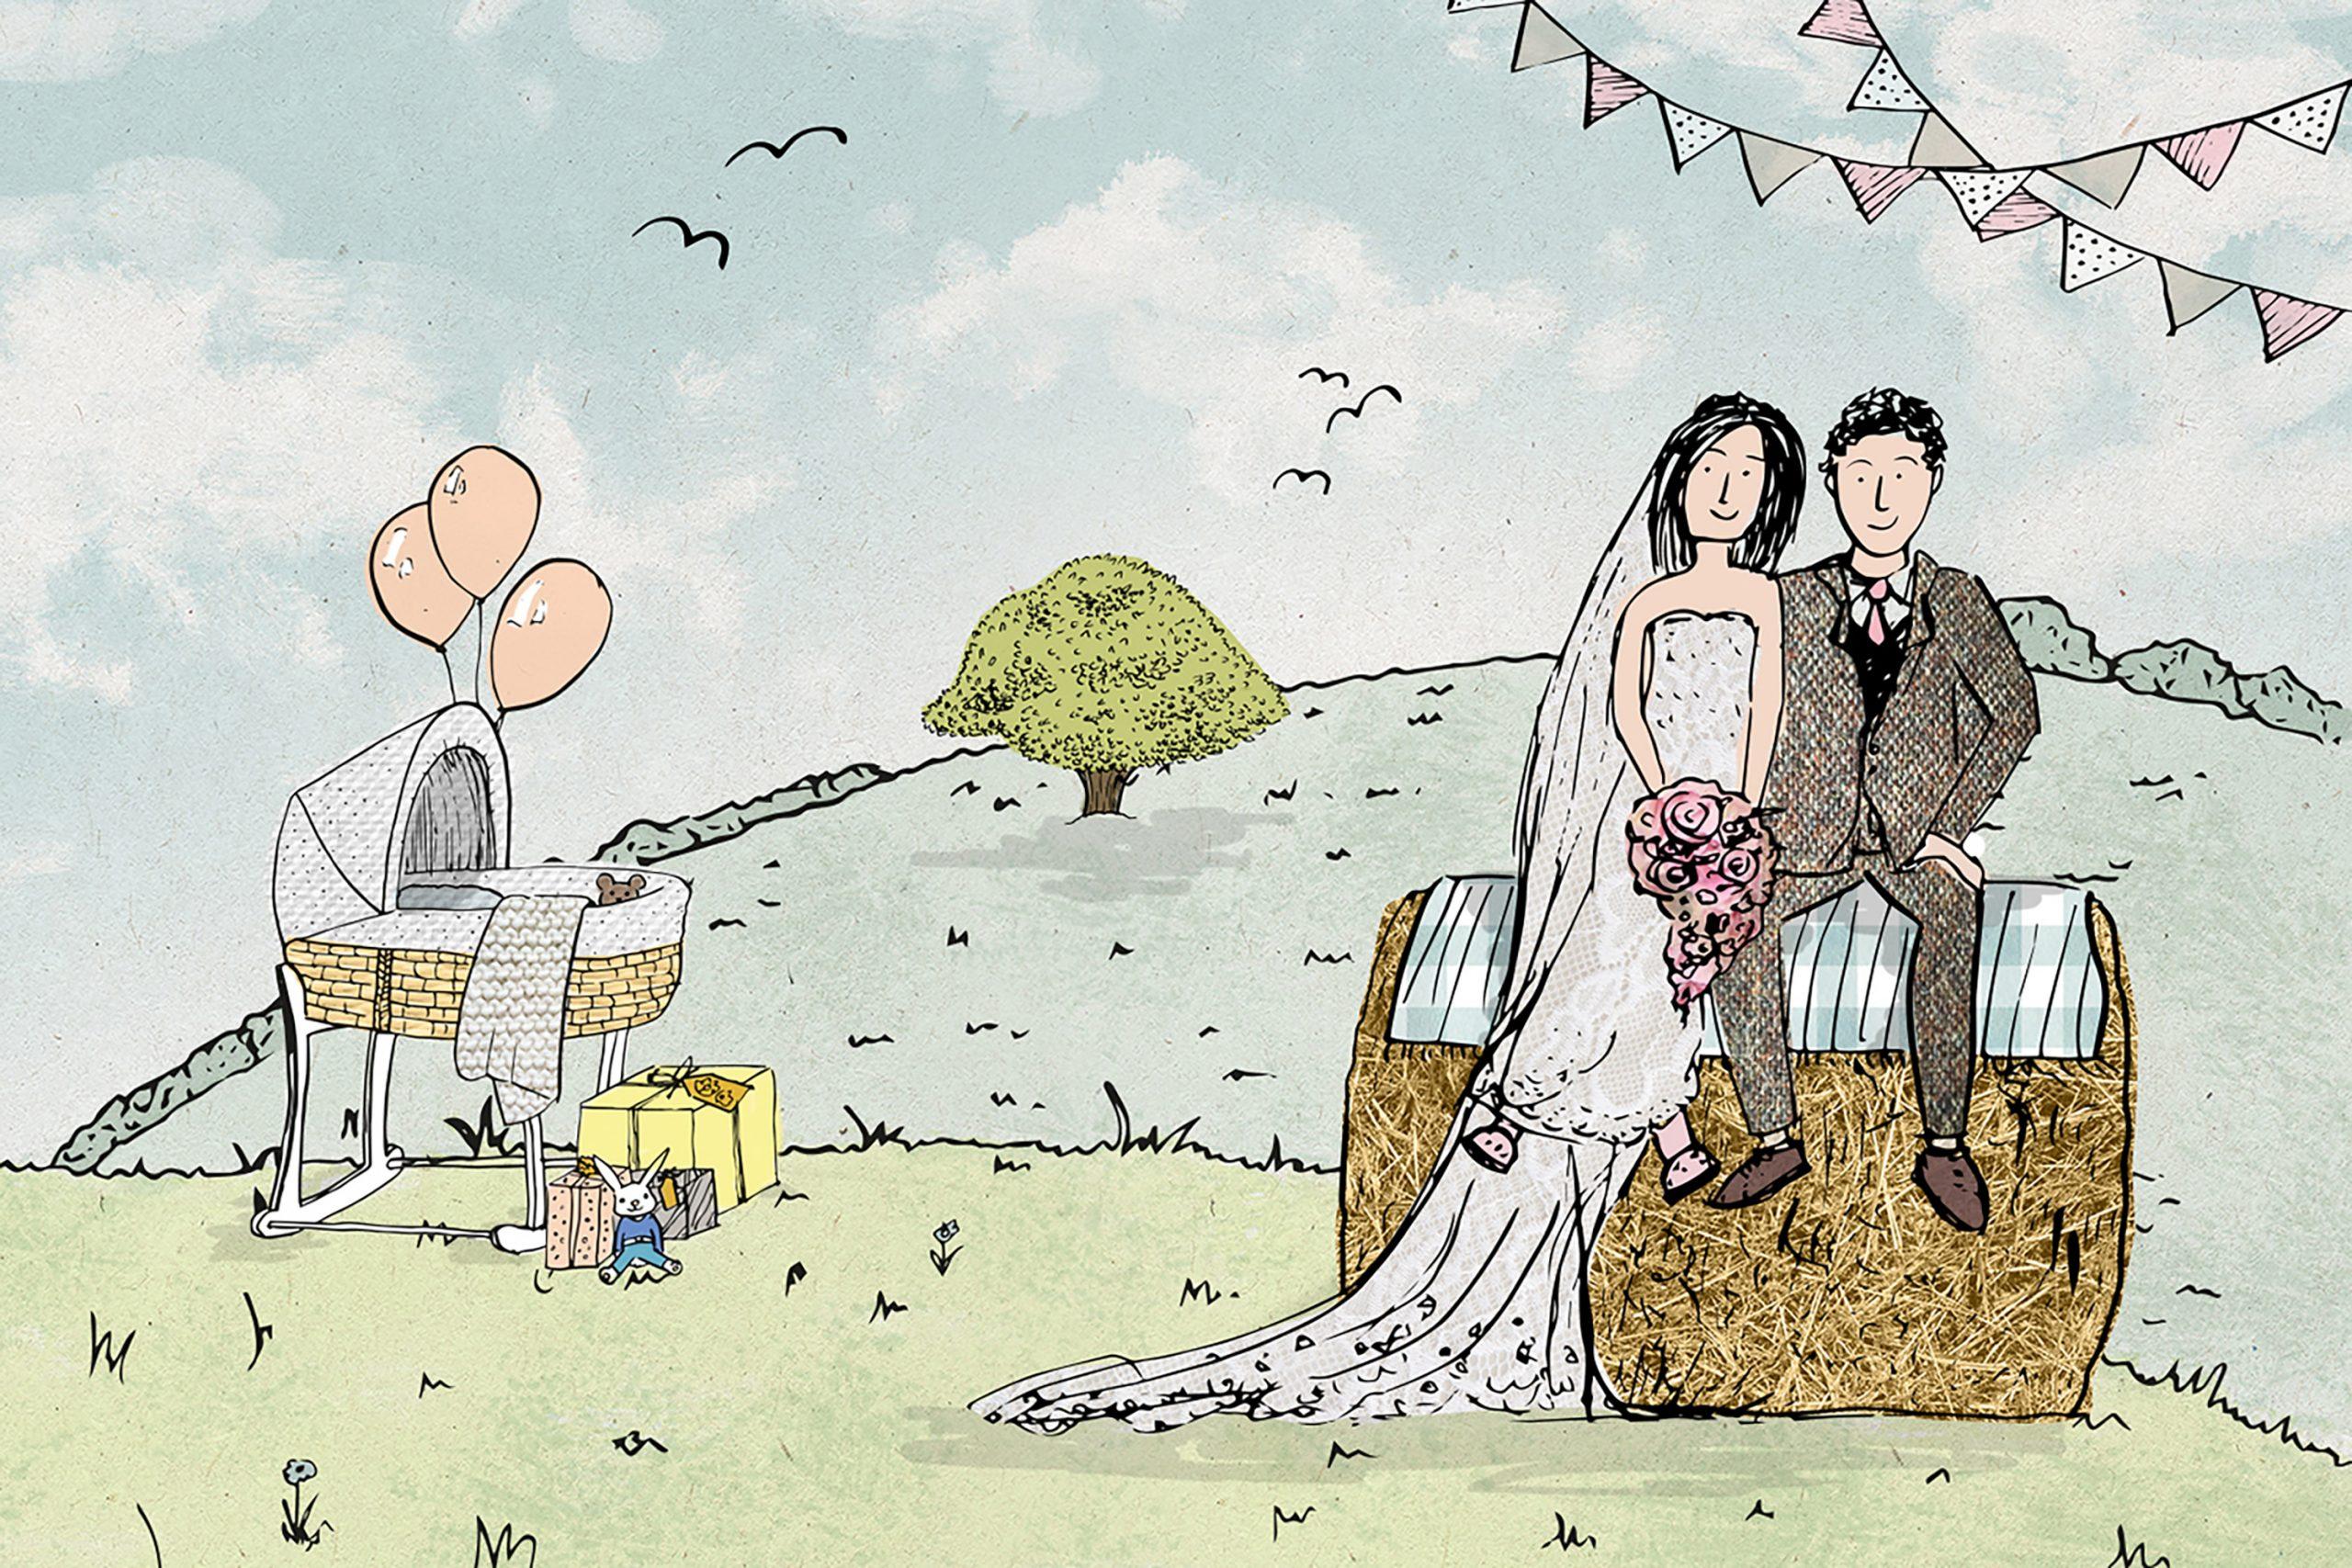 Graceful Gatherings Illustration